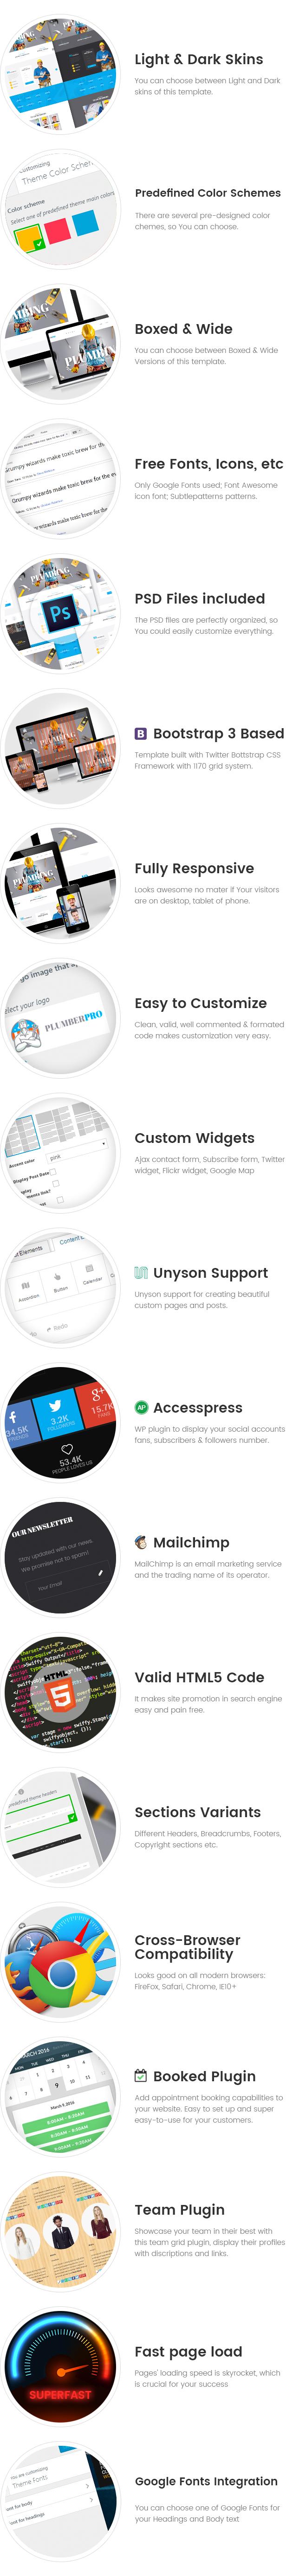 PlumberPlus - Handyman/Plumber Service WordPress Theme